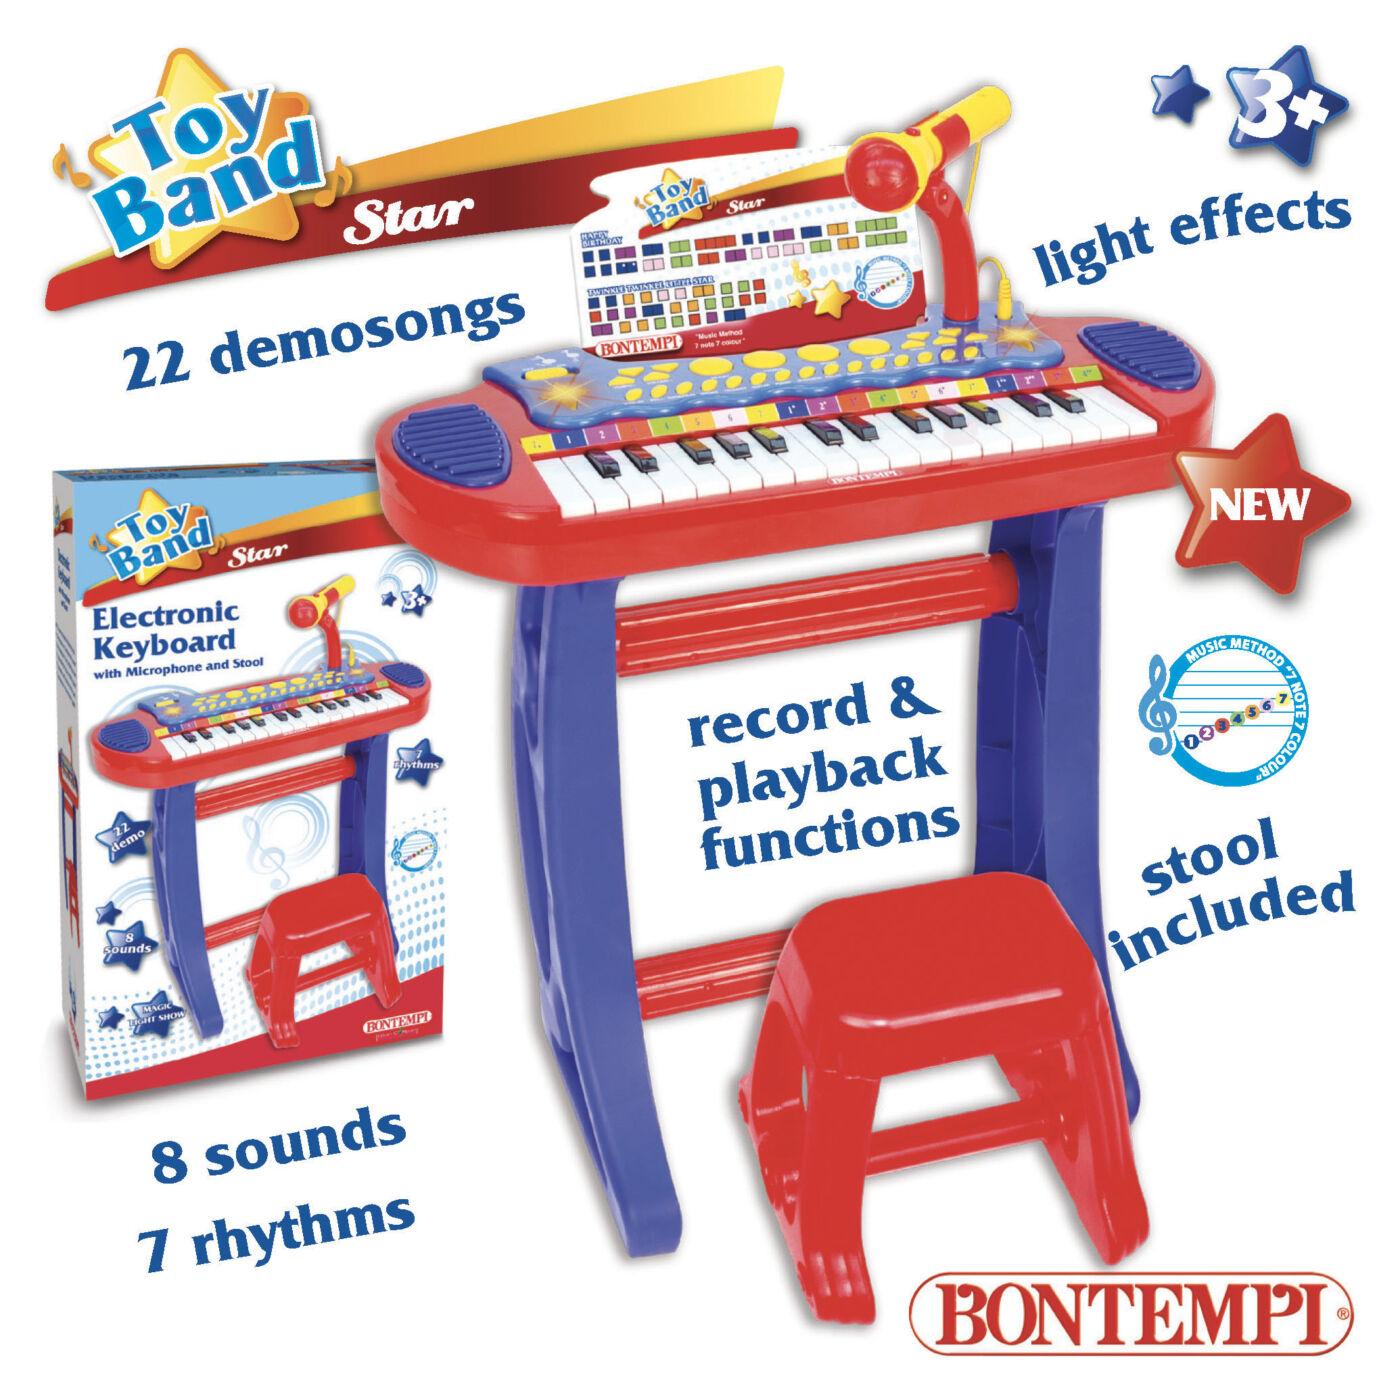 Bontempi 31 billentyűs orgona